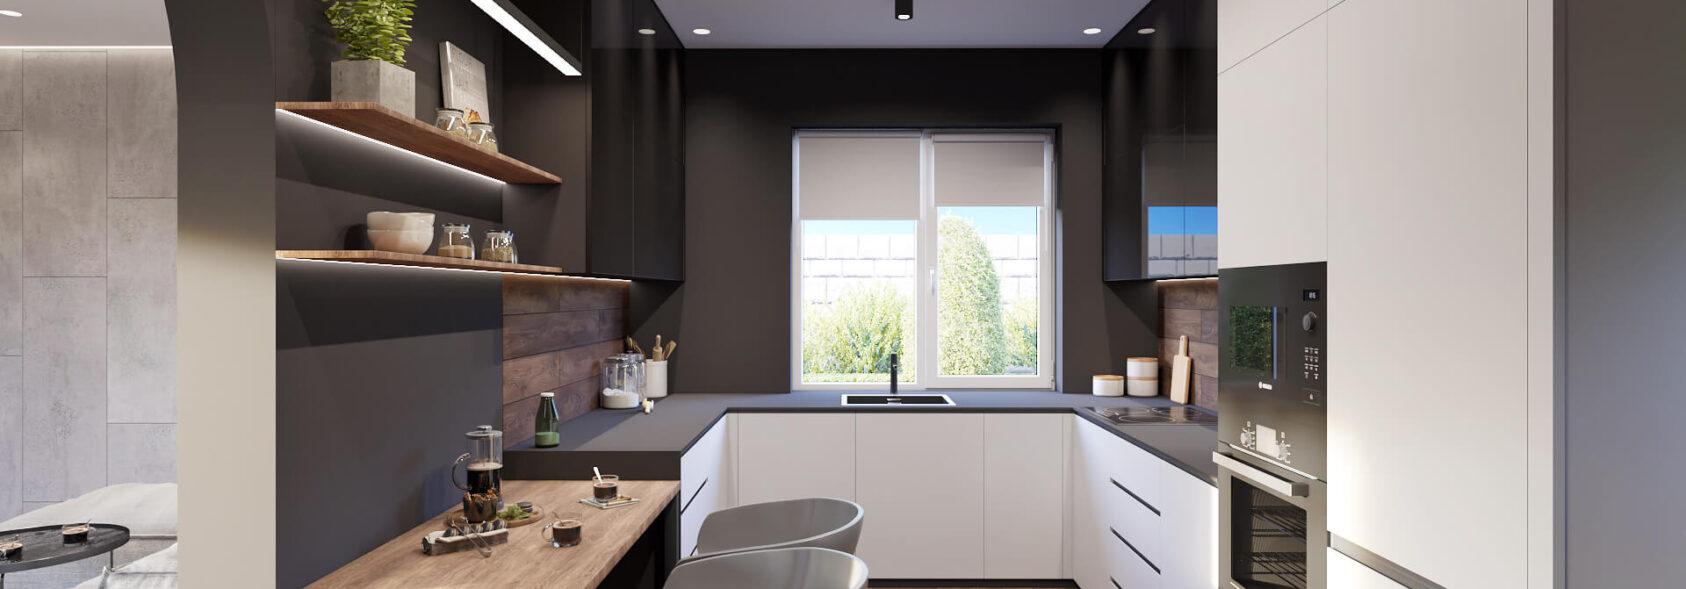 Заказать дизайн дома Балабино кухня